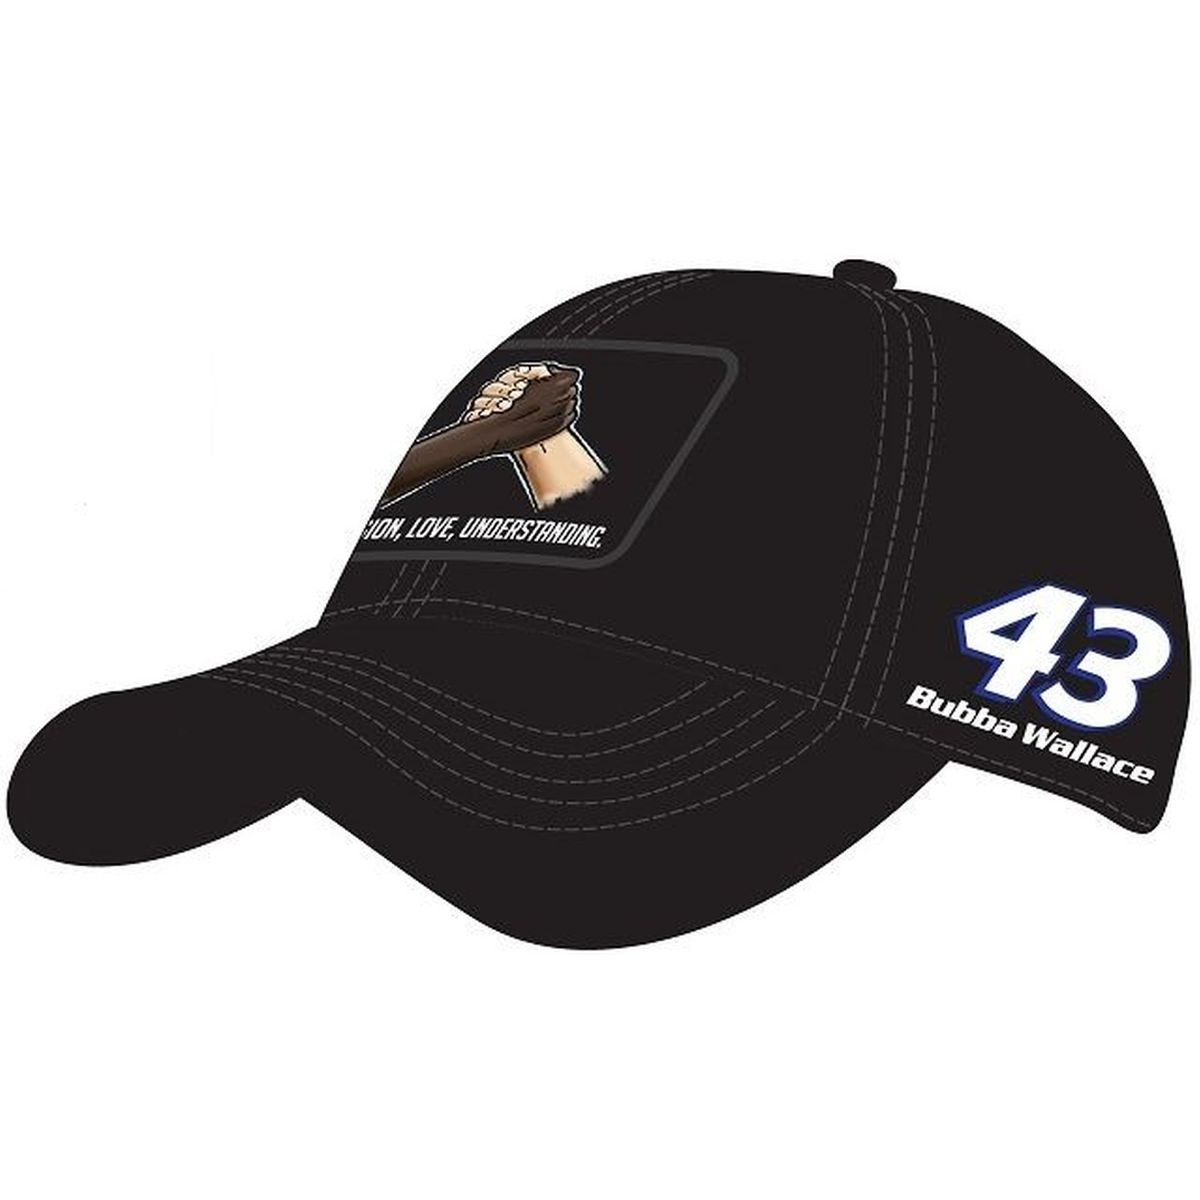 Bubba Wallace #43 2020 #BlackLivesMatter NASCAR Graphic Hat